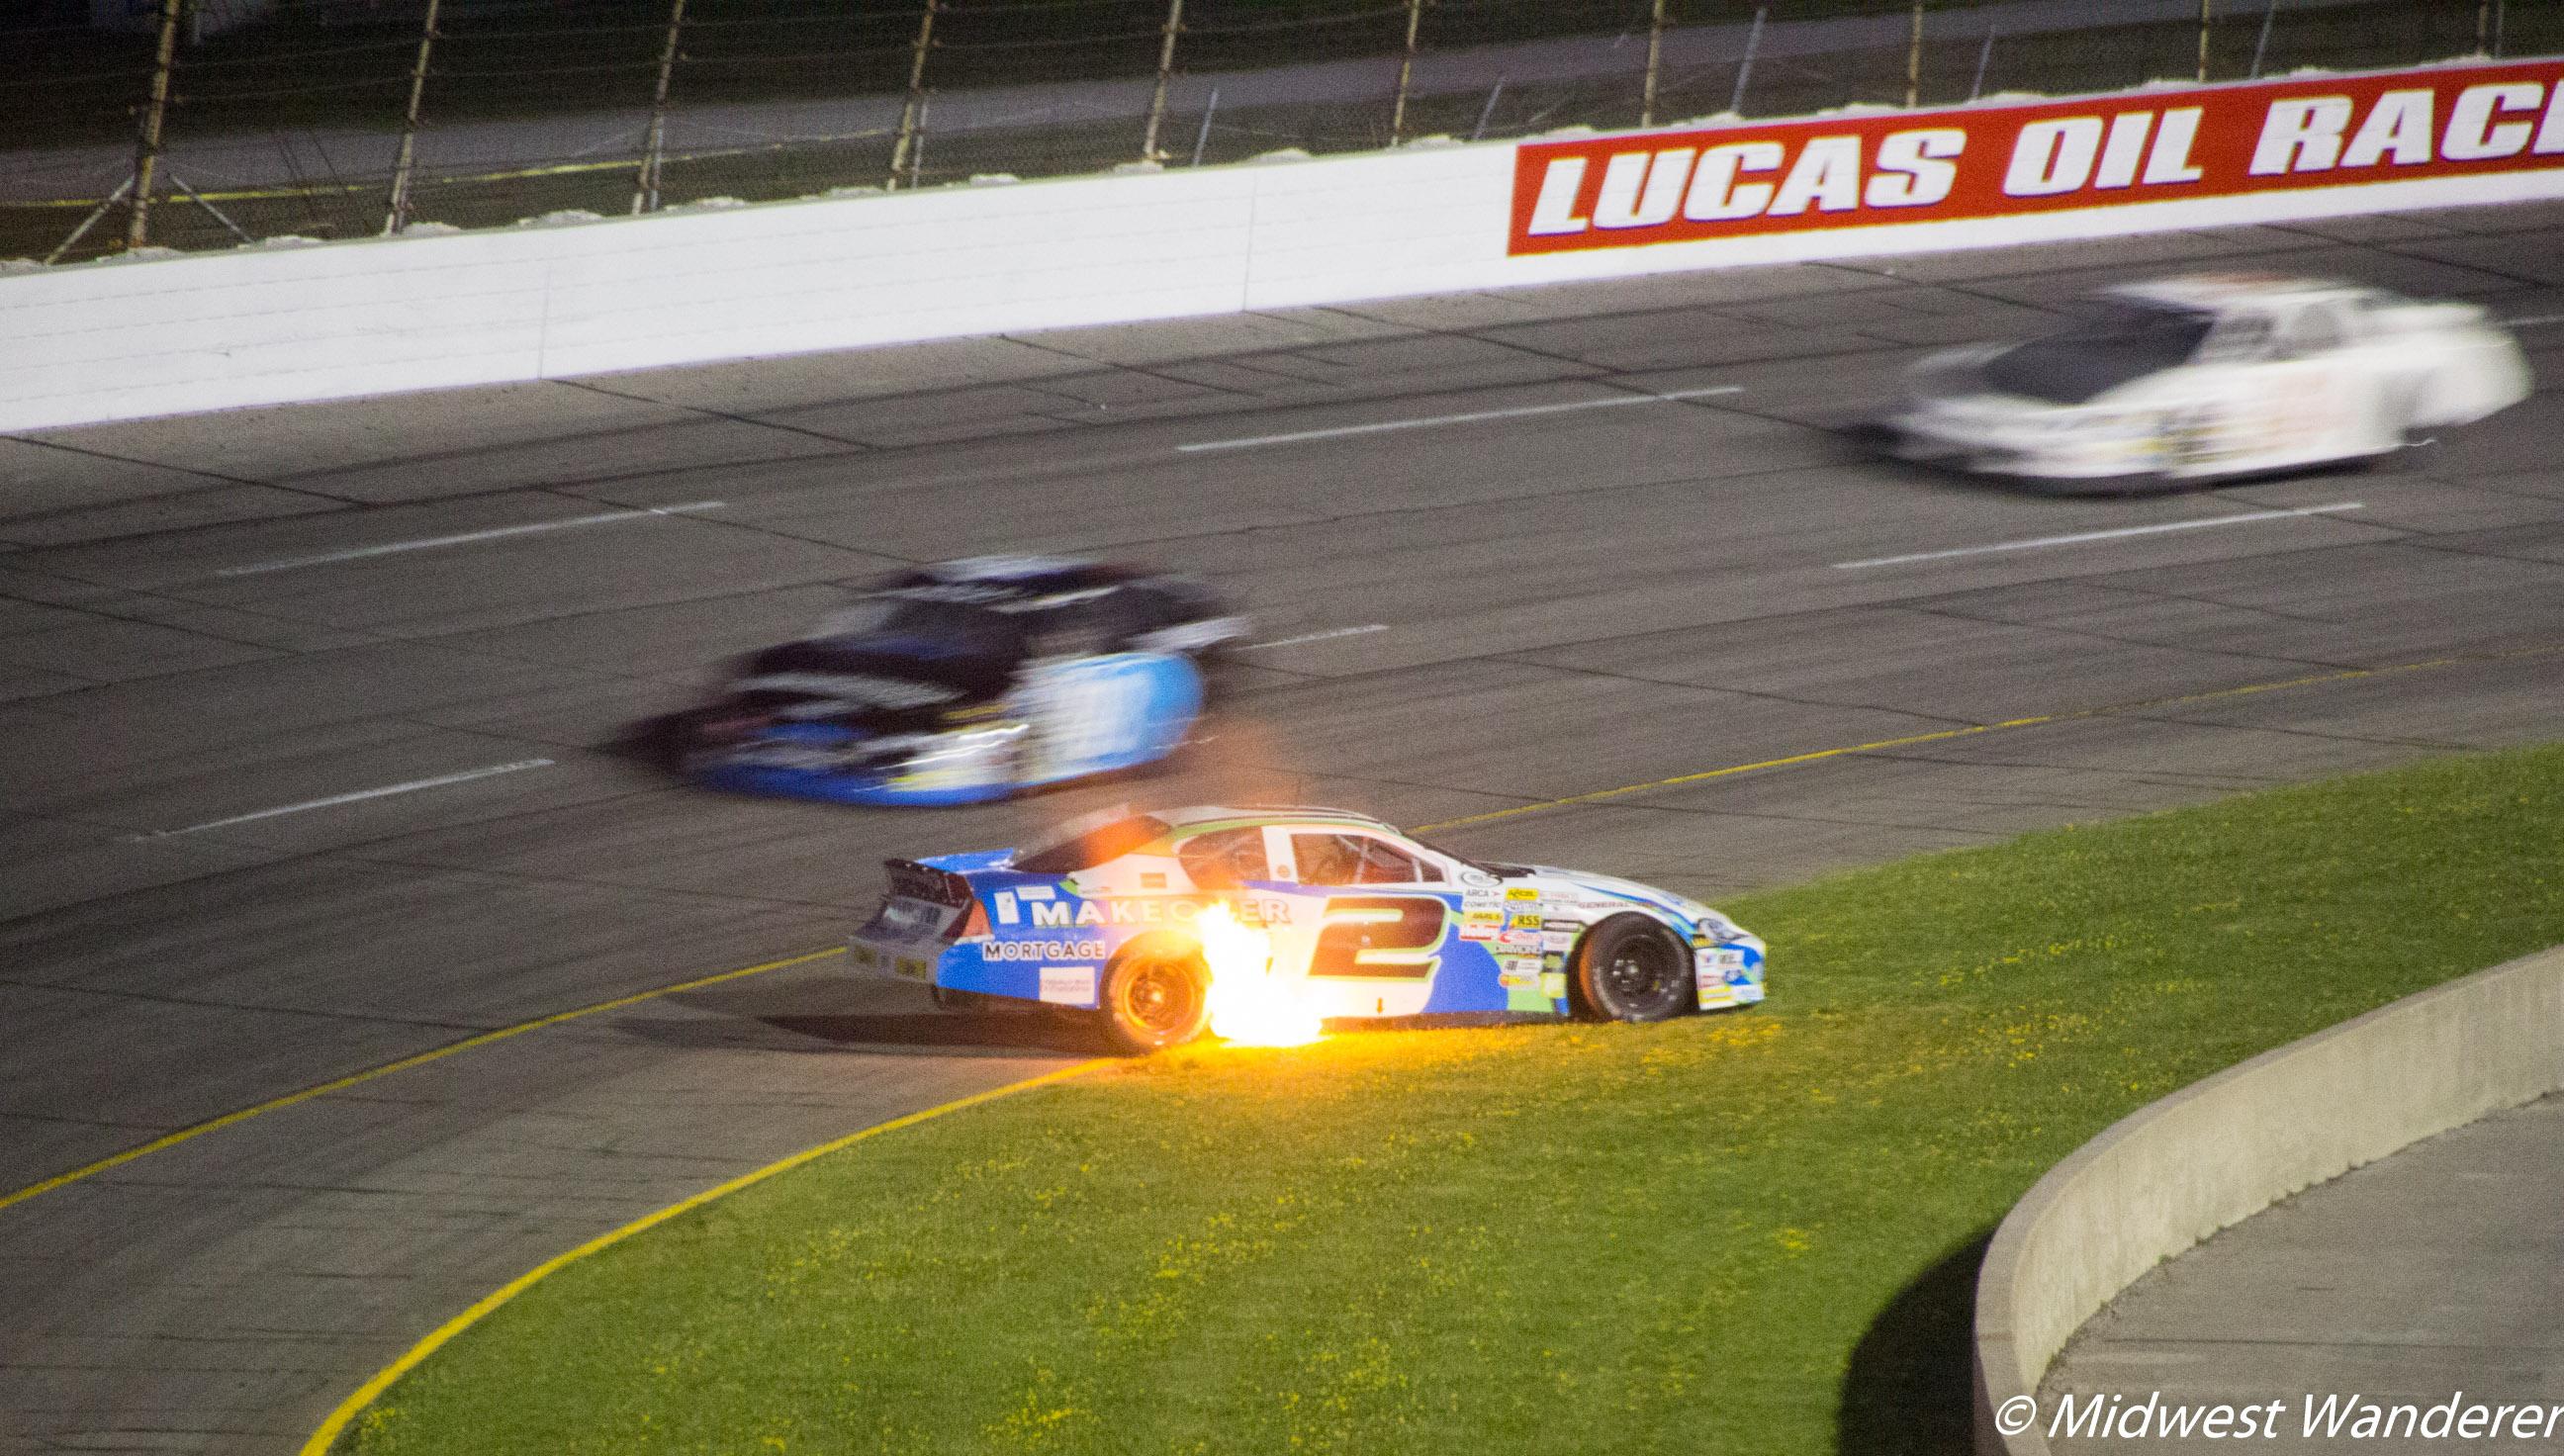 Lucas Oil Raceway - ARCA Souix Chief Power PEX 200 - 7